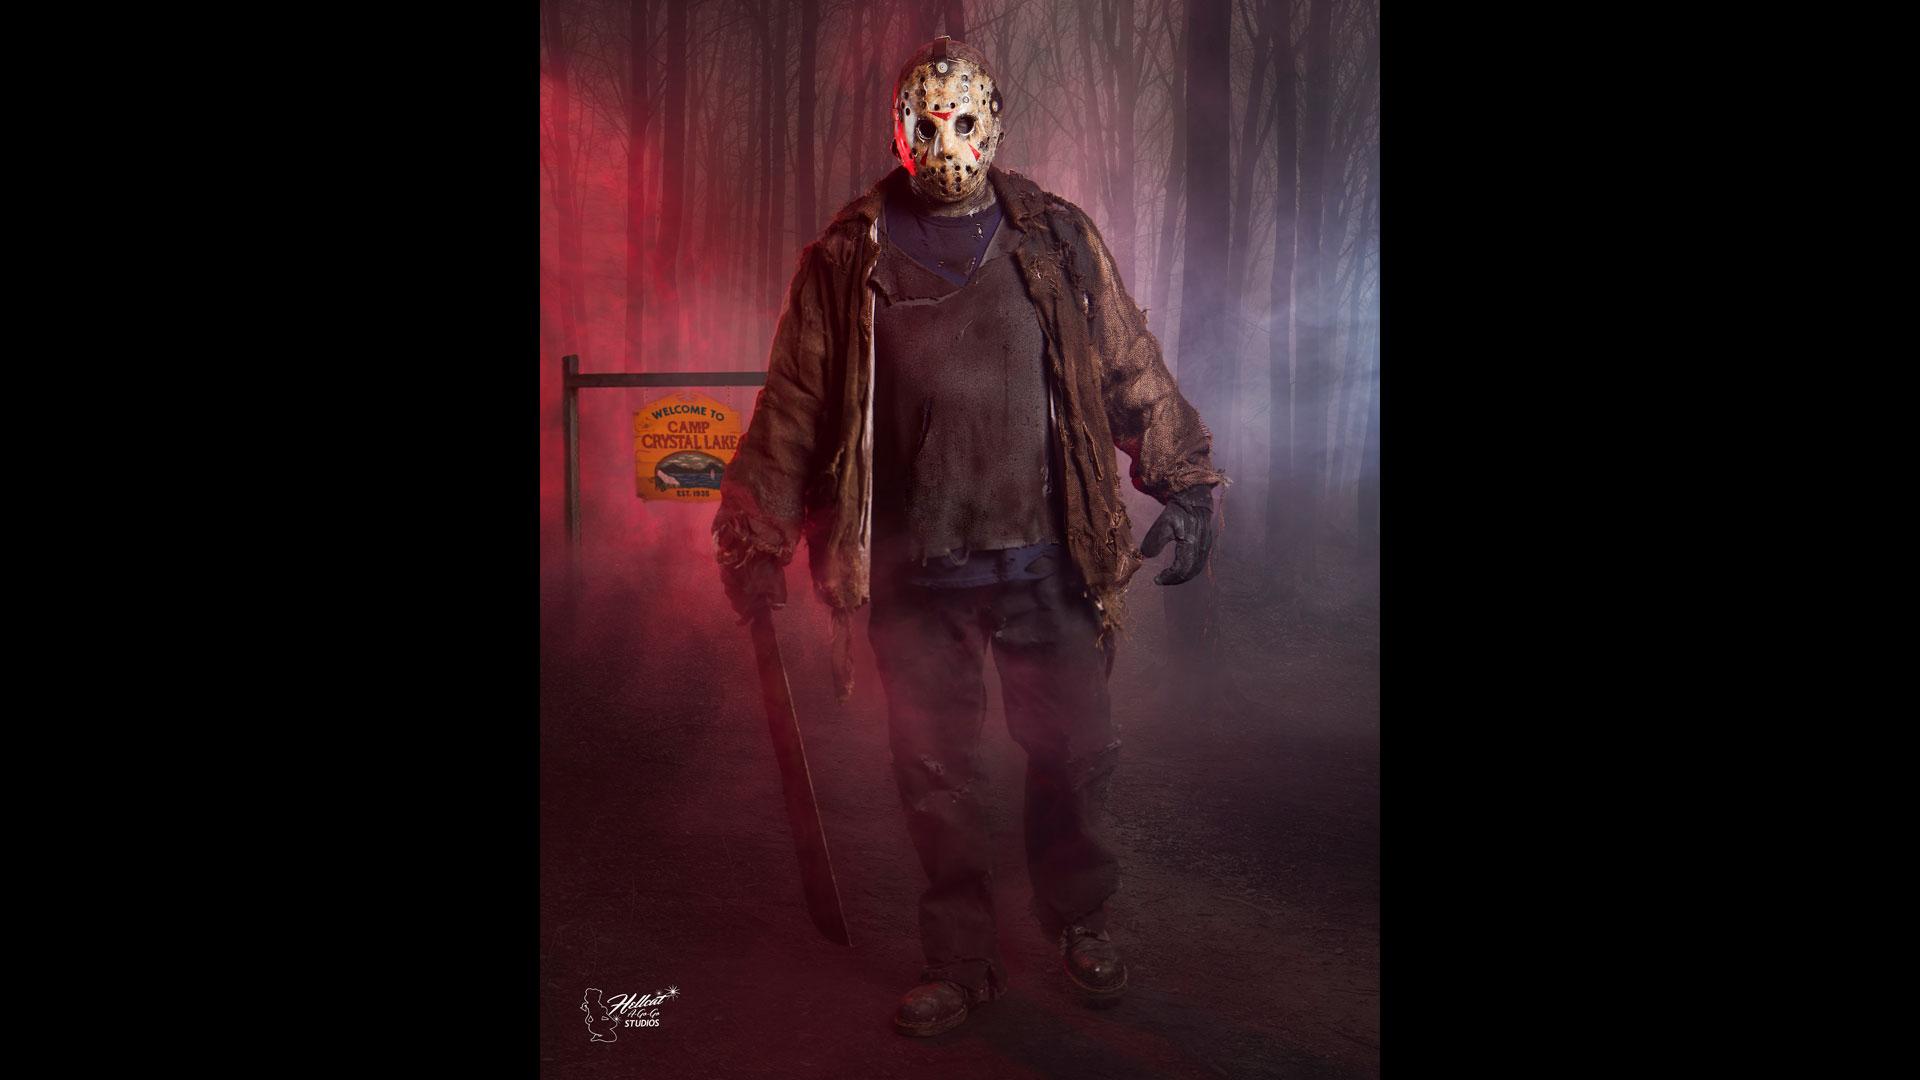 Horror | Photographer: Hellcat A-Go-GoCurator: Bryan Esler